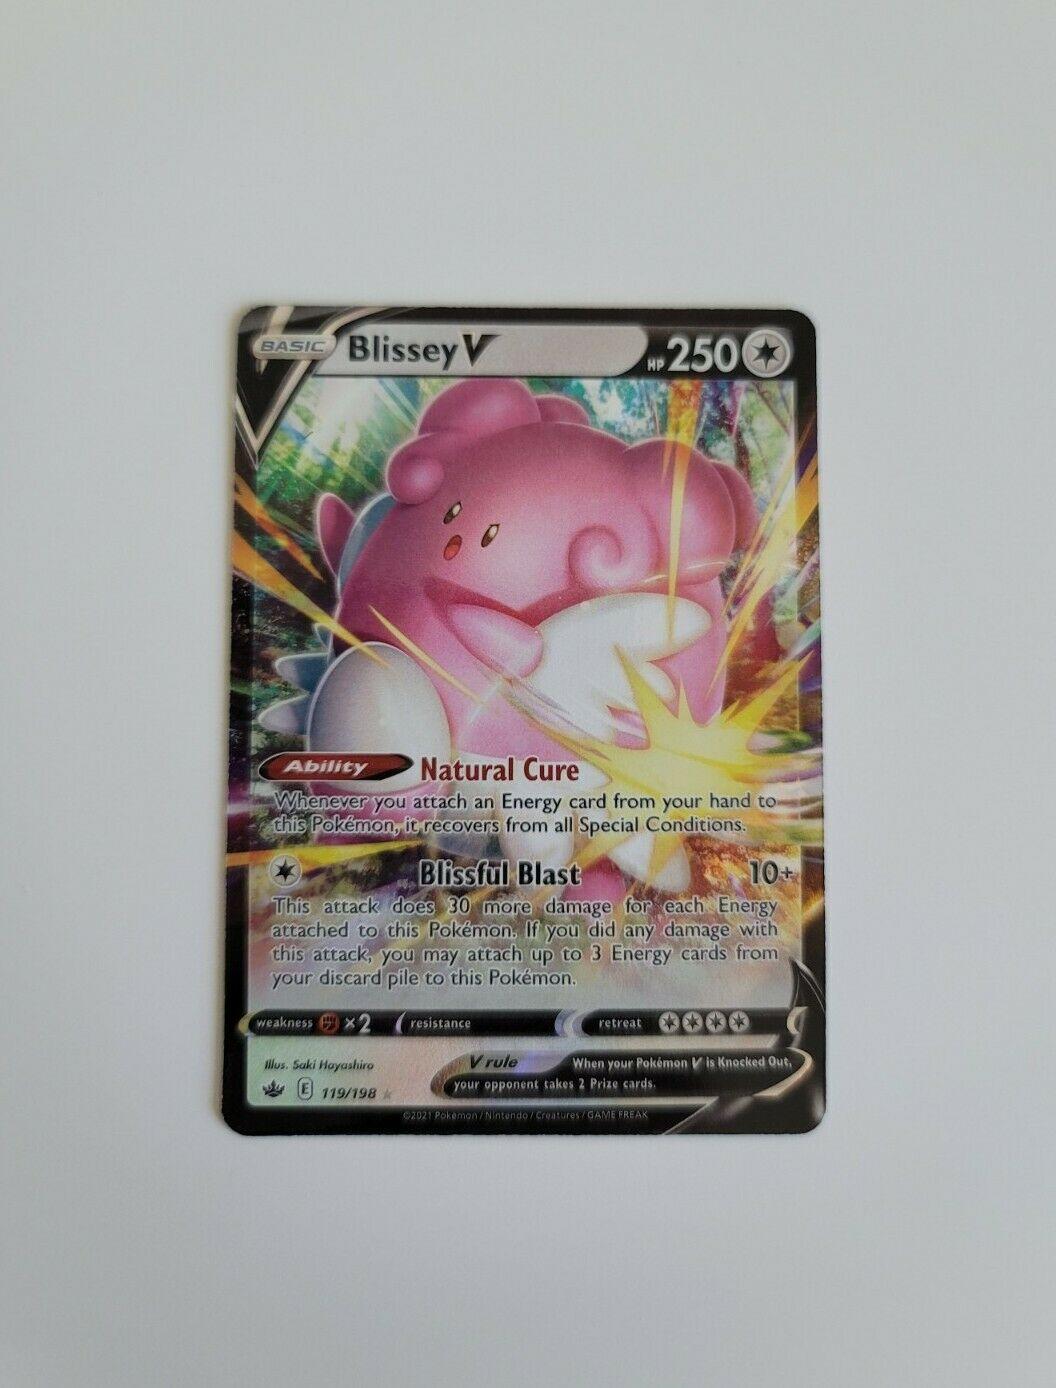 Blissey V 119/198 Chilling Reign Ultra Rare Holo Pokemon Card NM - Image 1